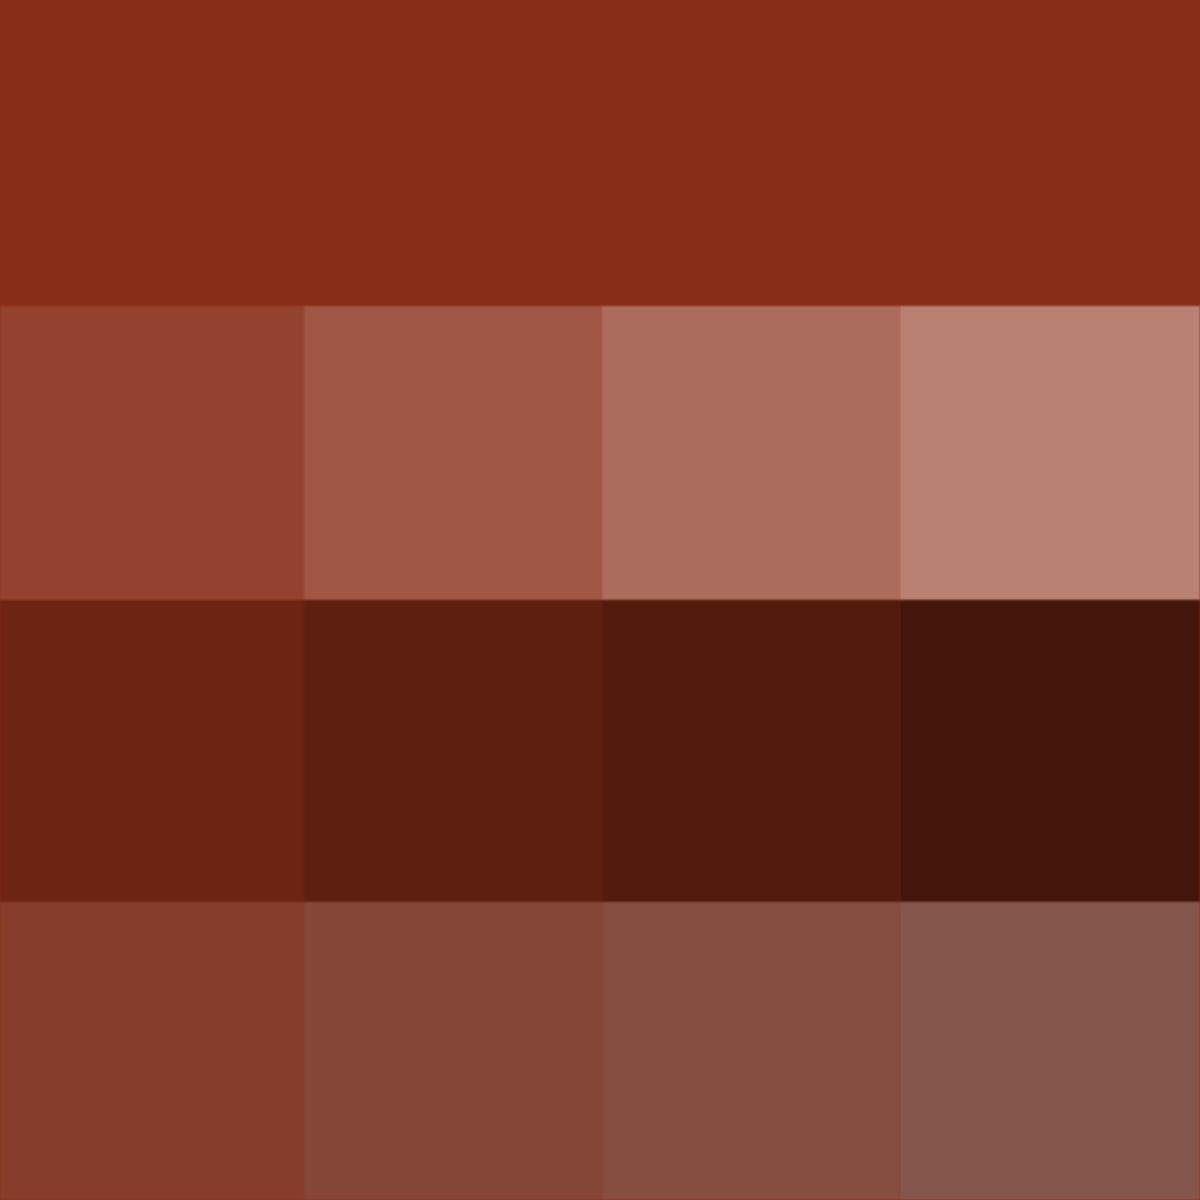 Sienna Hue Tints Shades Tones Hue Pure Color With Tints Hue White Shades Hue Black And Tones Hue Grey Wh Color Color Theory Mauve Color Sienna, in its natural state, gets its coloring from iron oxide and manganese minerals. sienna hue tints shades tones hue